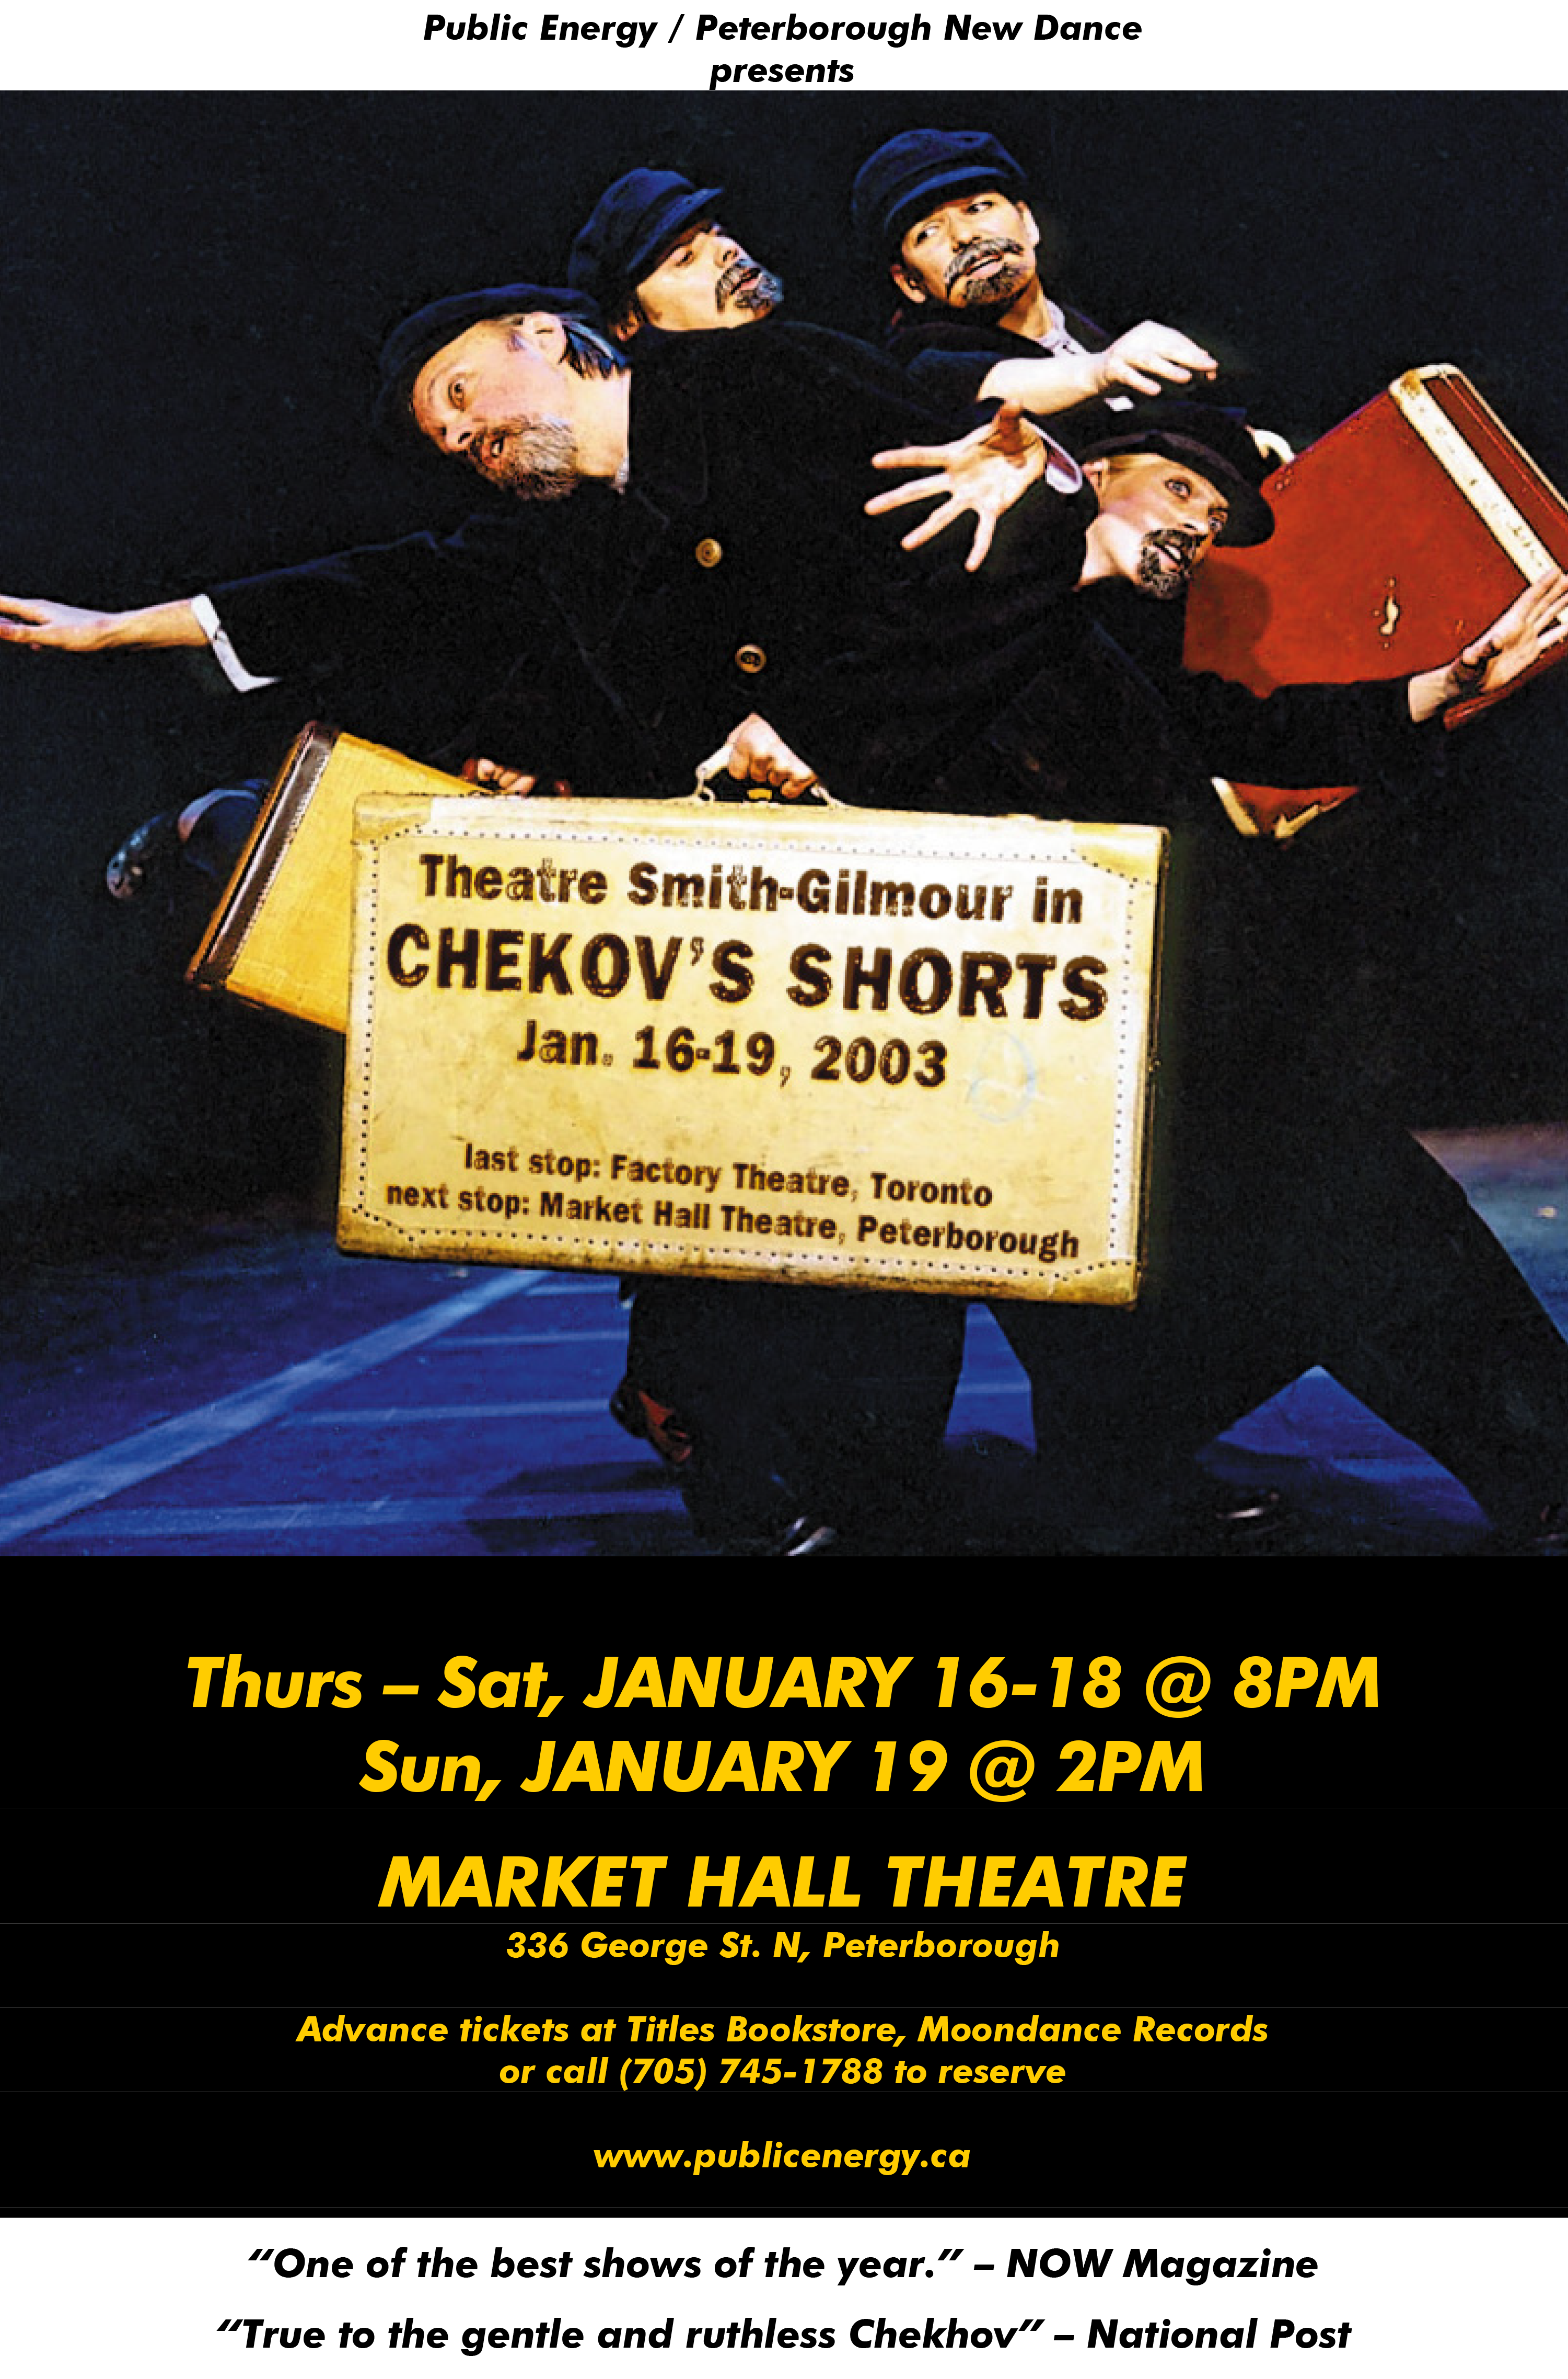 Poster for Checkov's Shorts